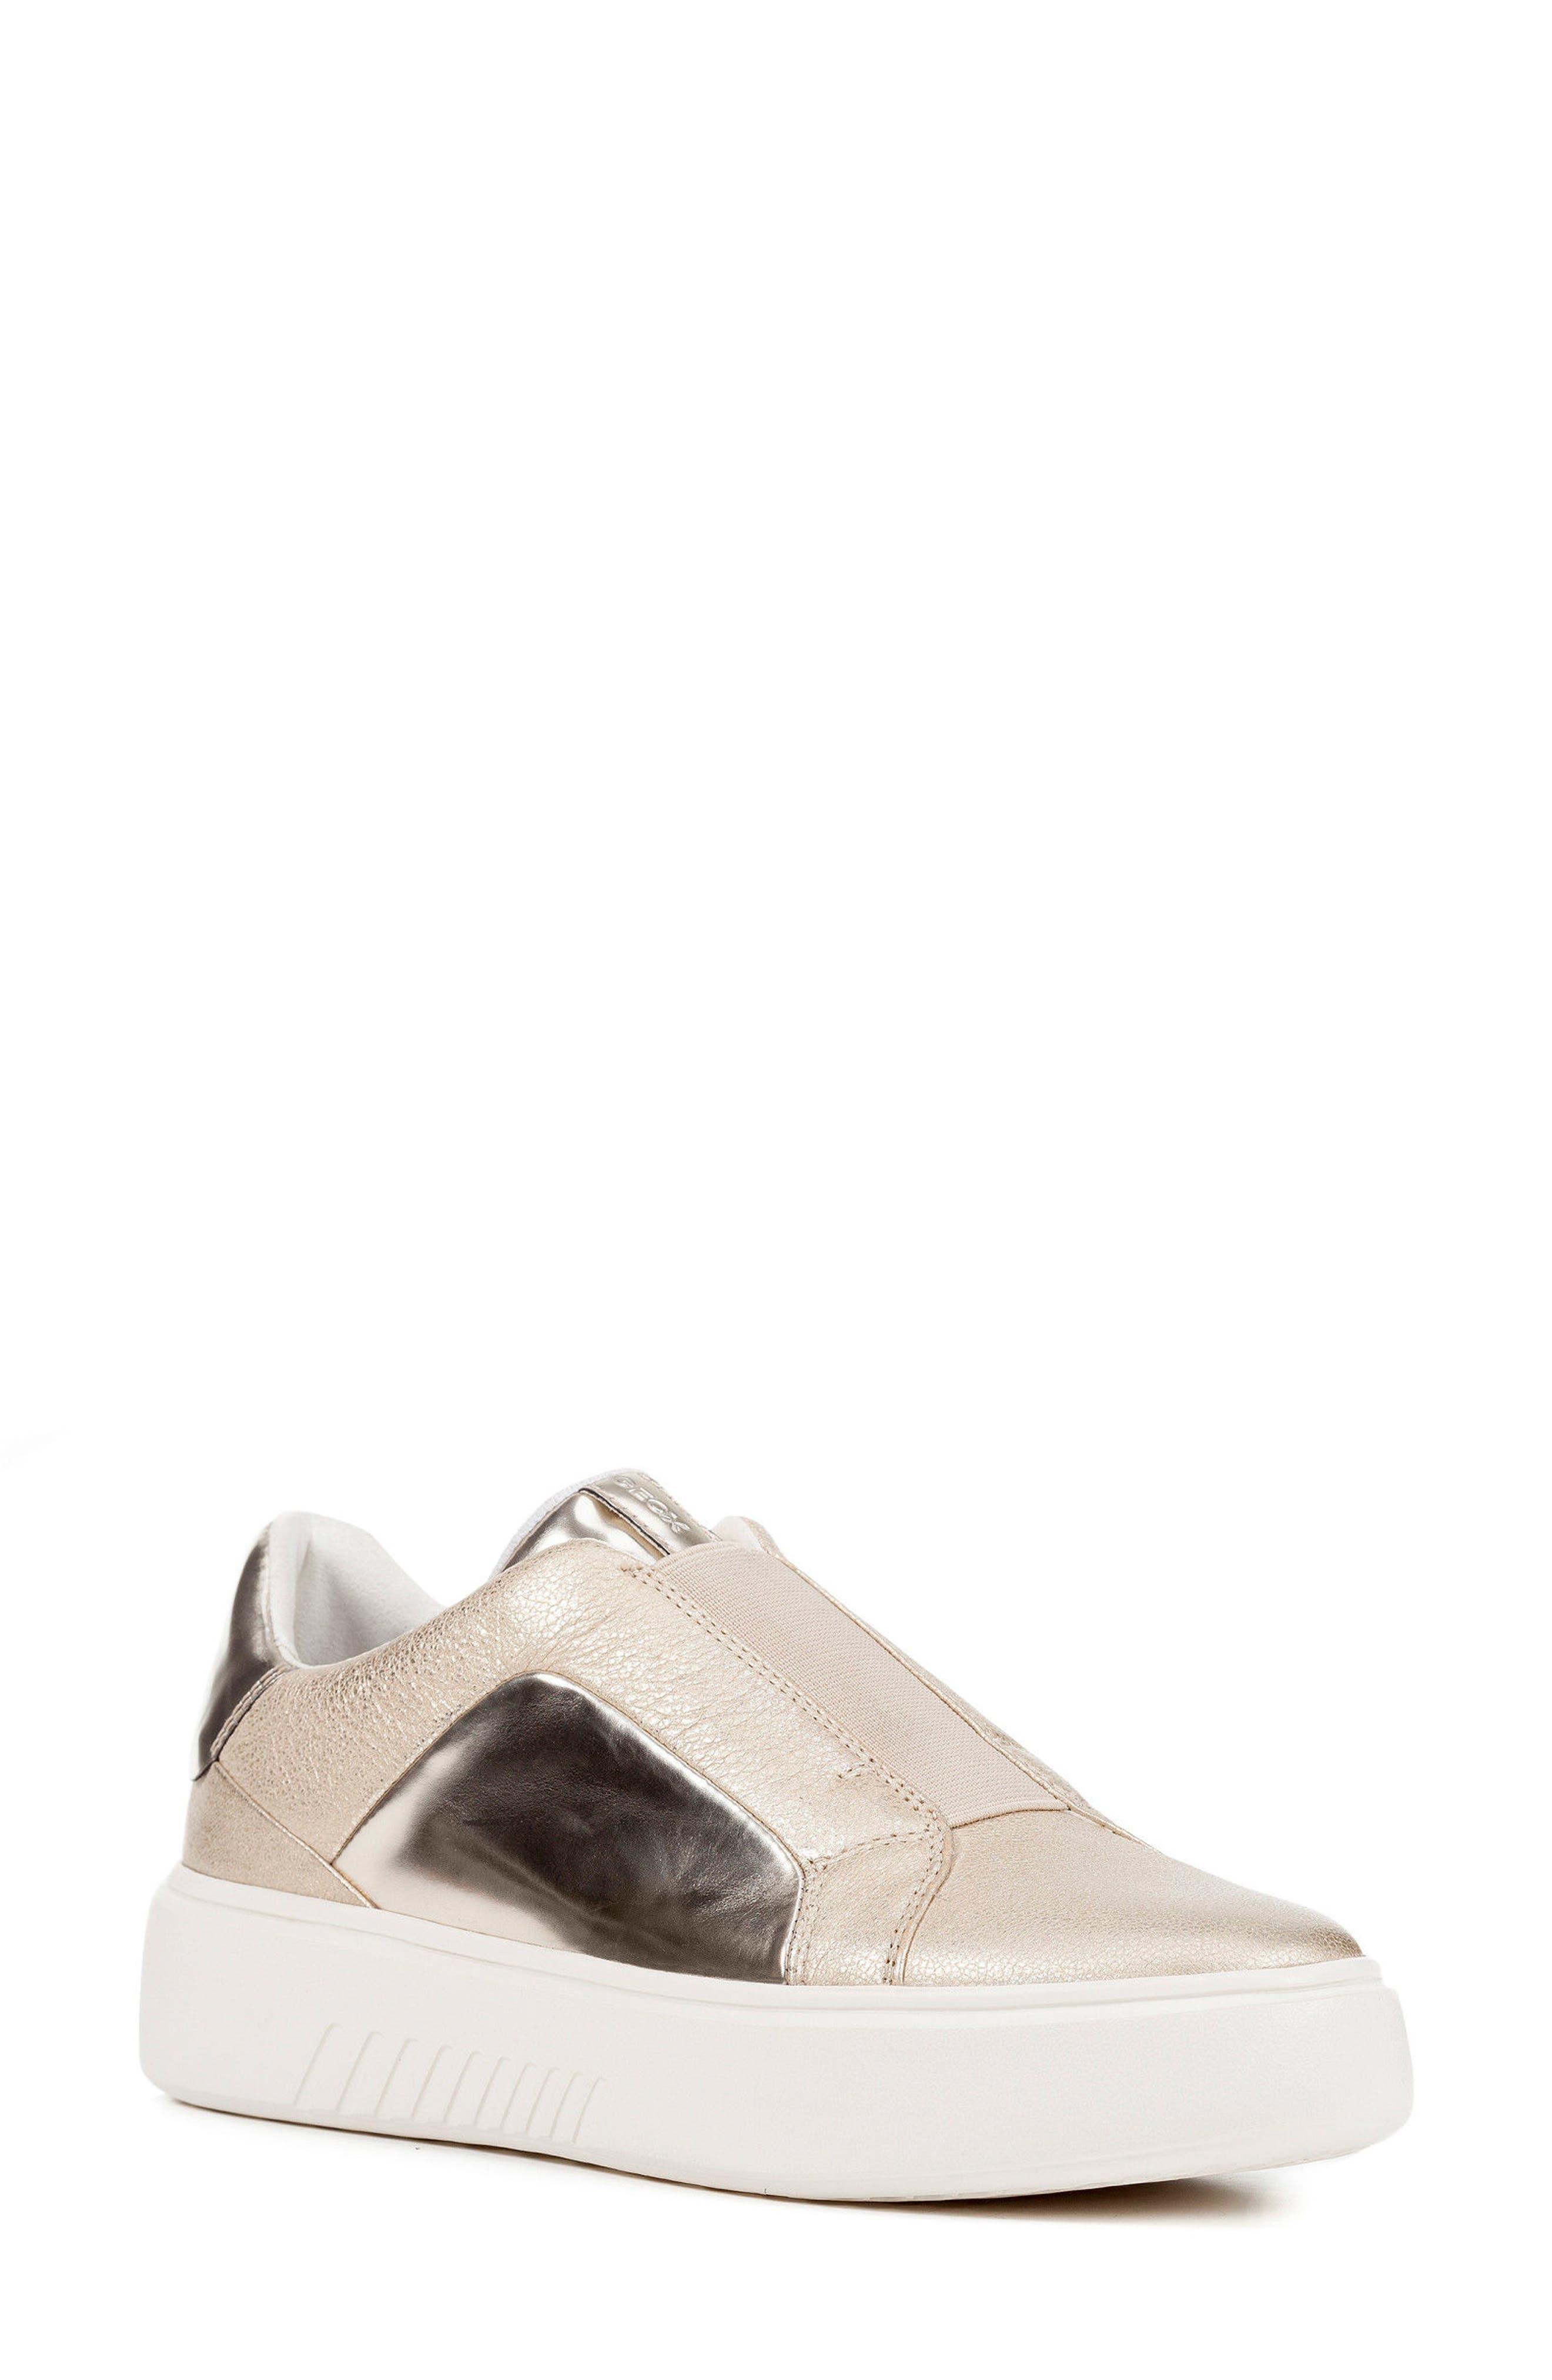 Nhenbus Slip-On Sneaker,                             Main thumbnail 2, color,